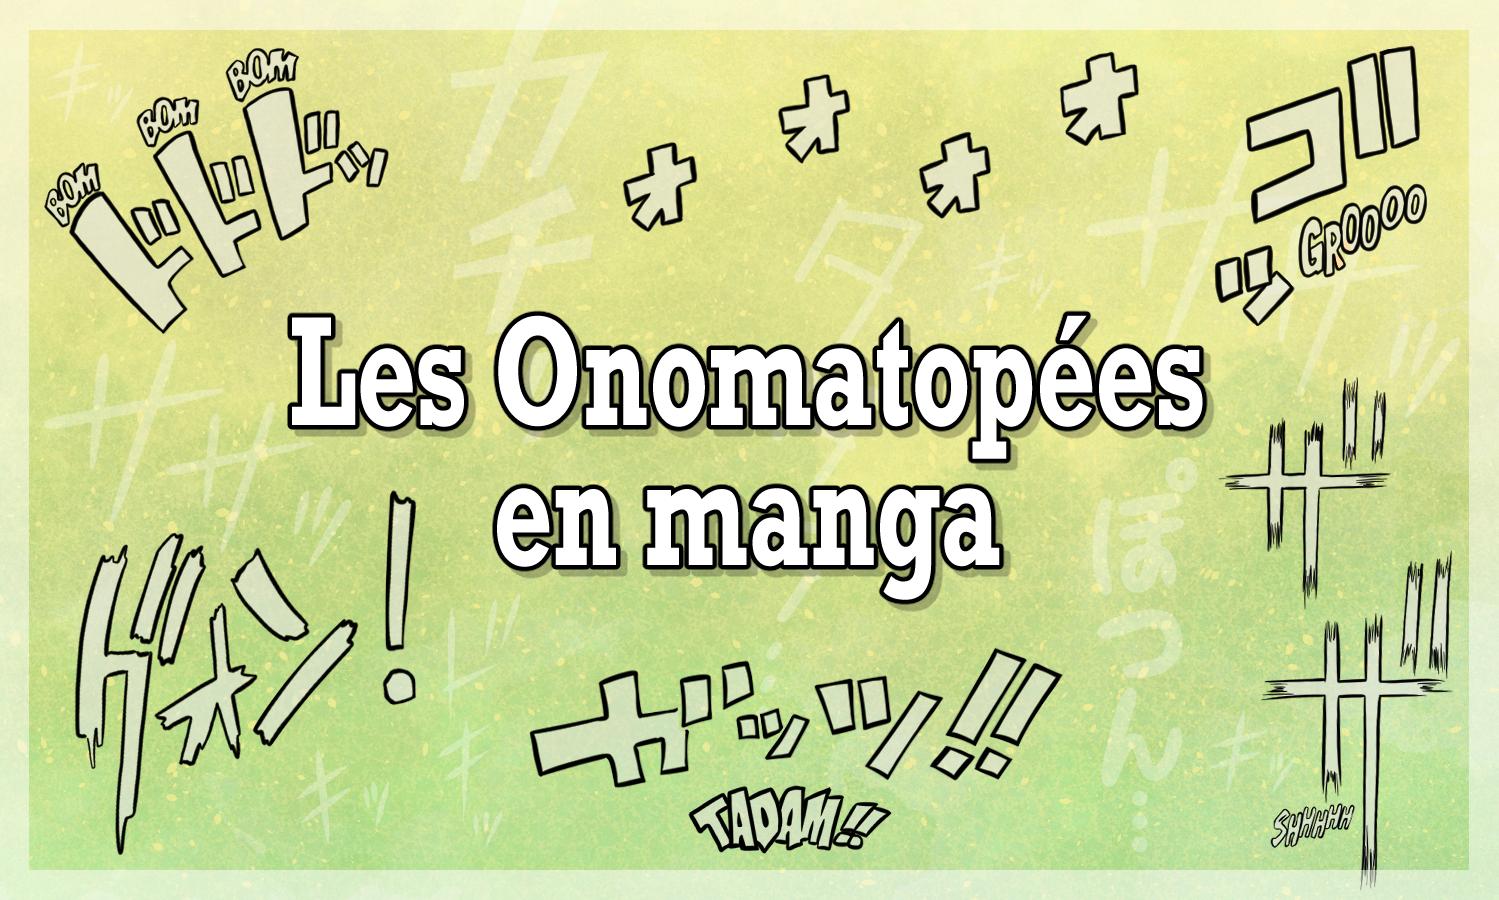 Les onomatopées en manga